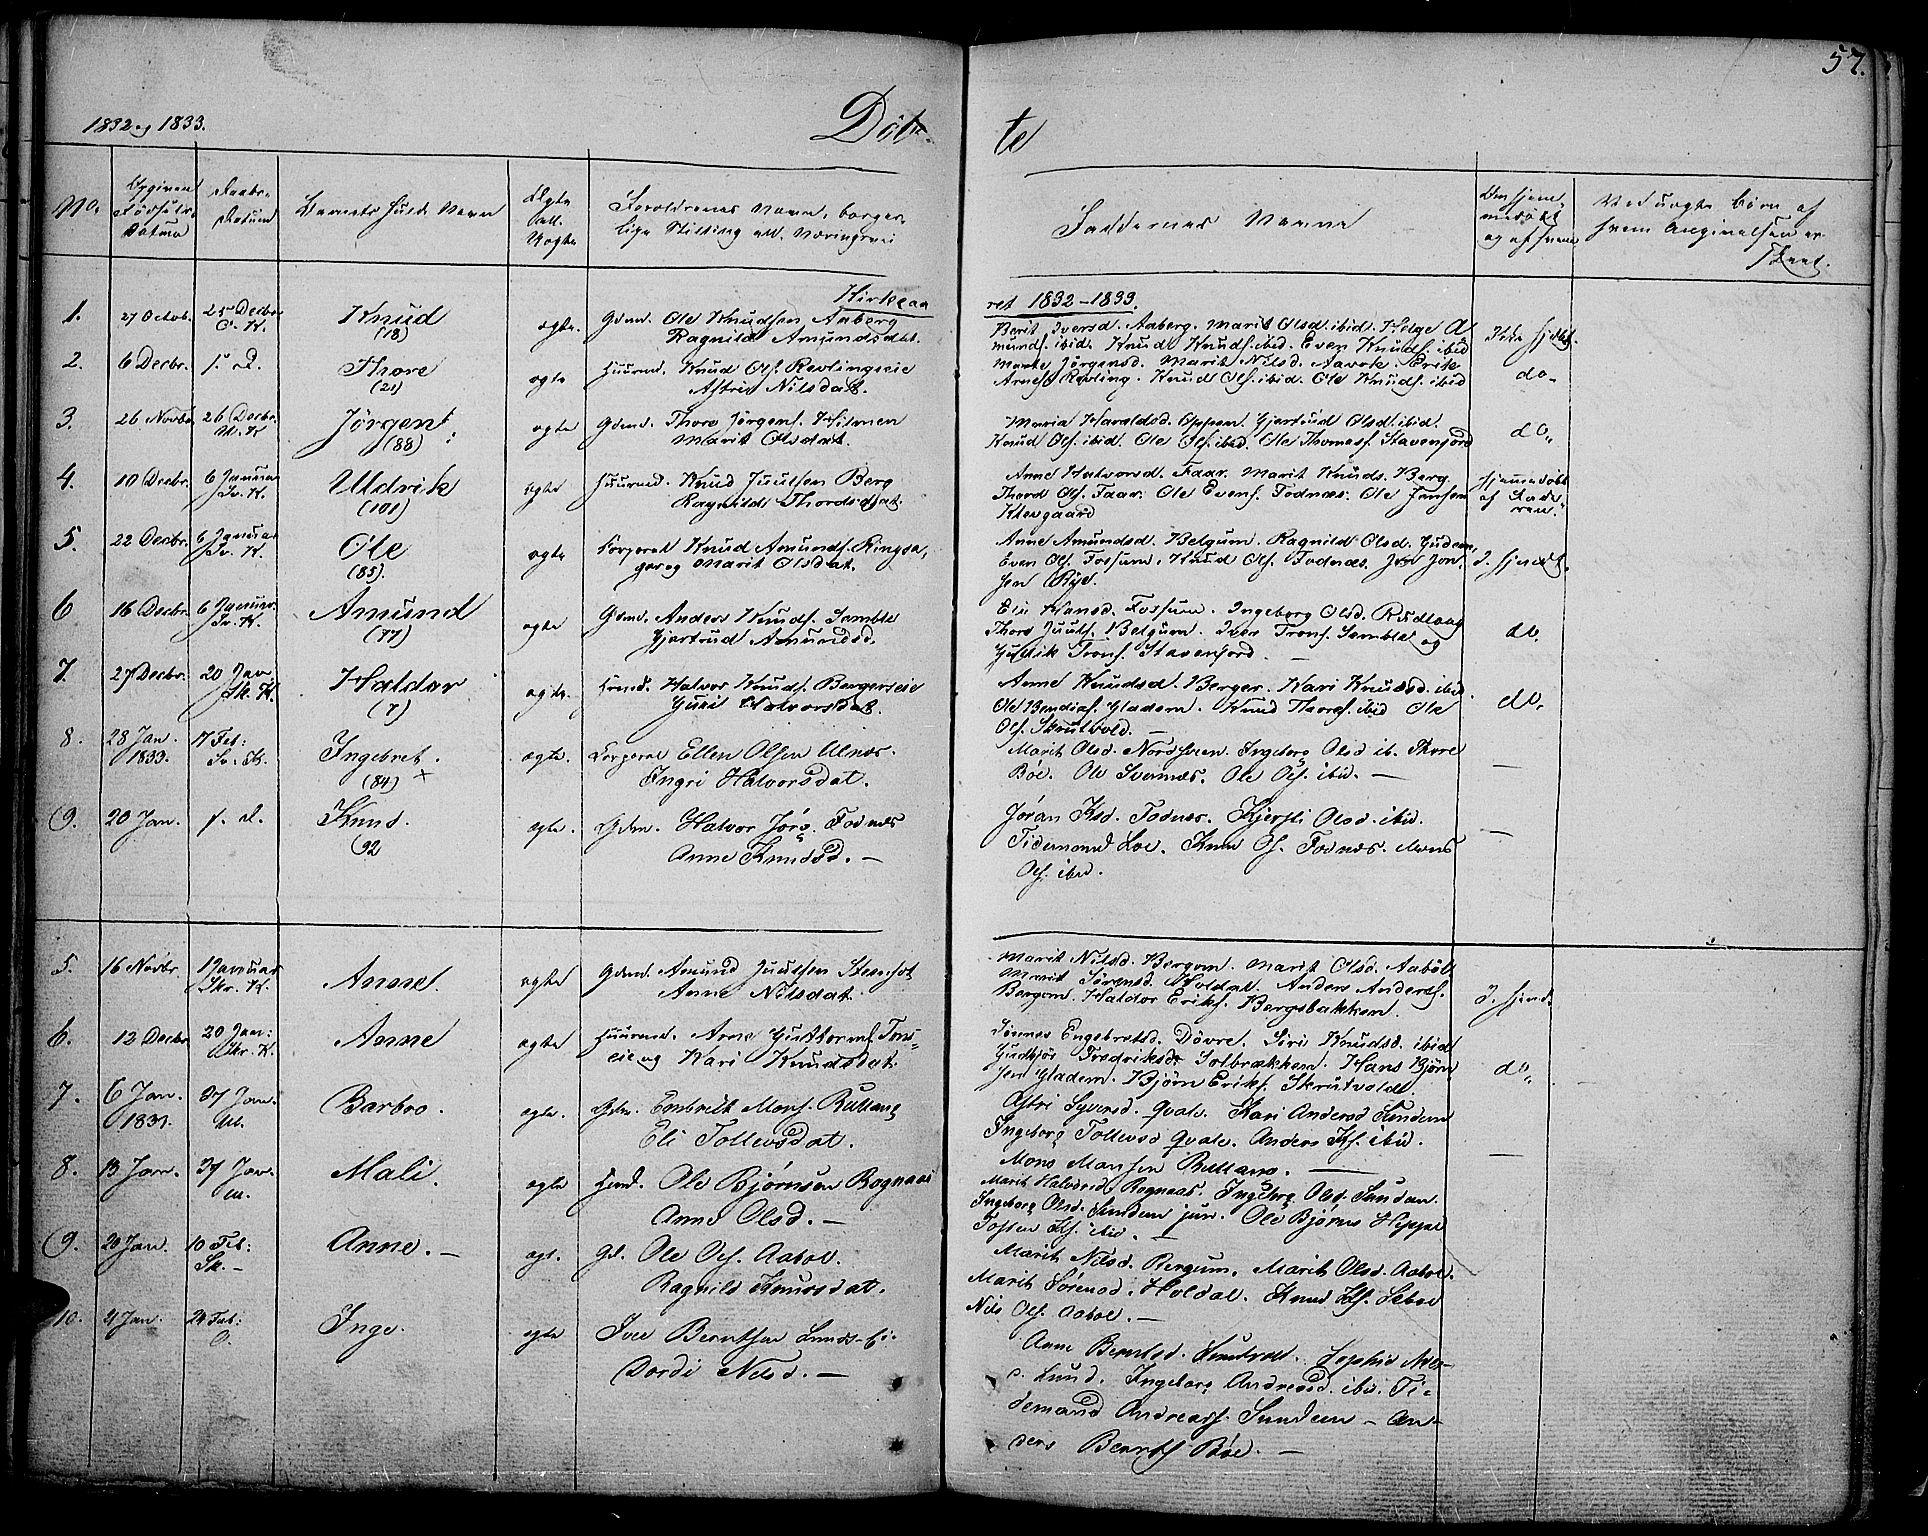 SAH, Nord-Aurdal prestekontor, Ministerialbok nr. 3, 1828-1841, s. 57